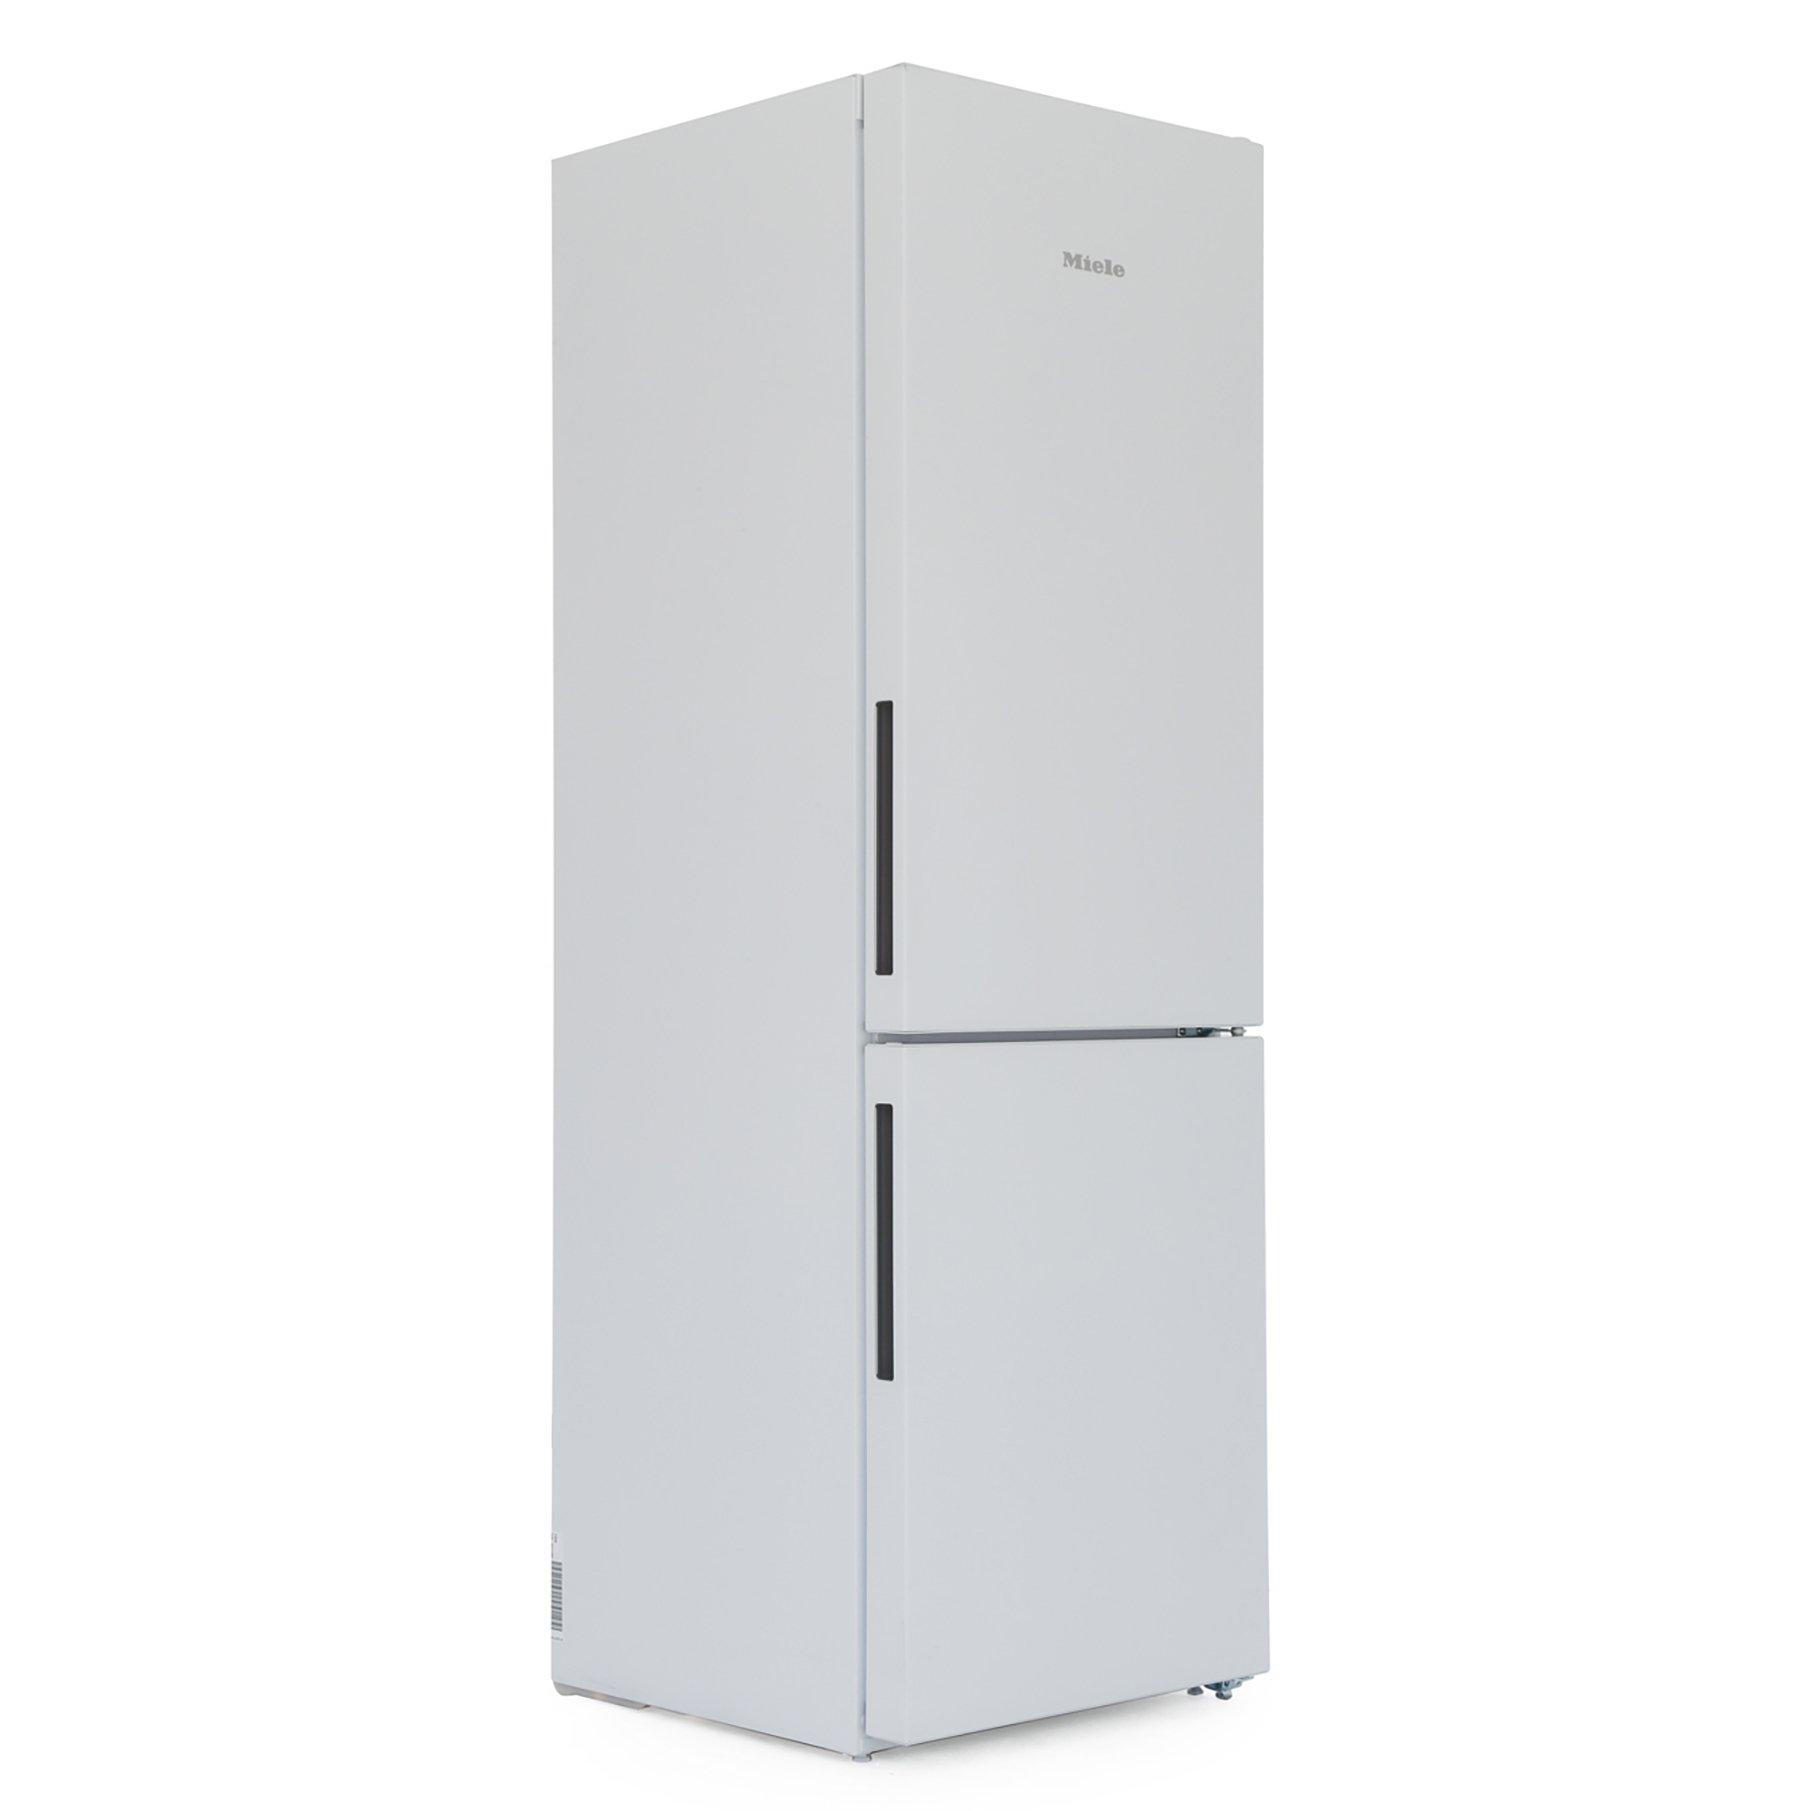 Miele KFN 28133 D White Fridge Freezer